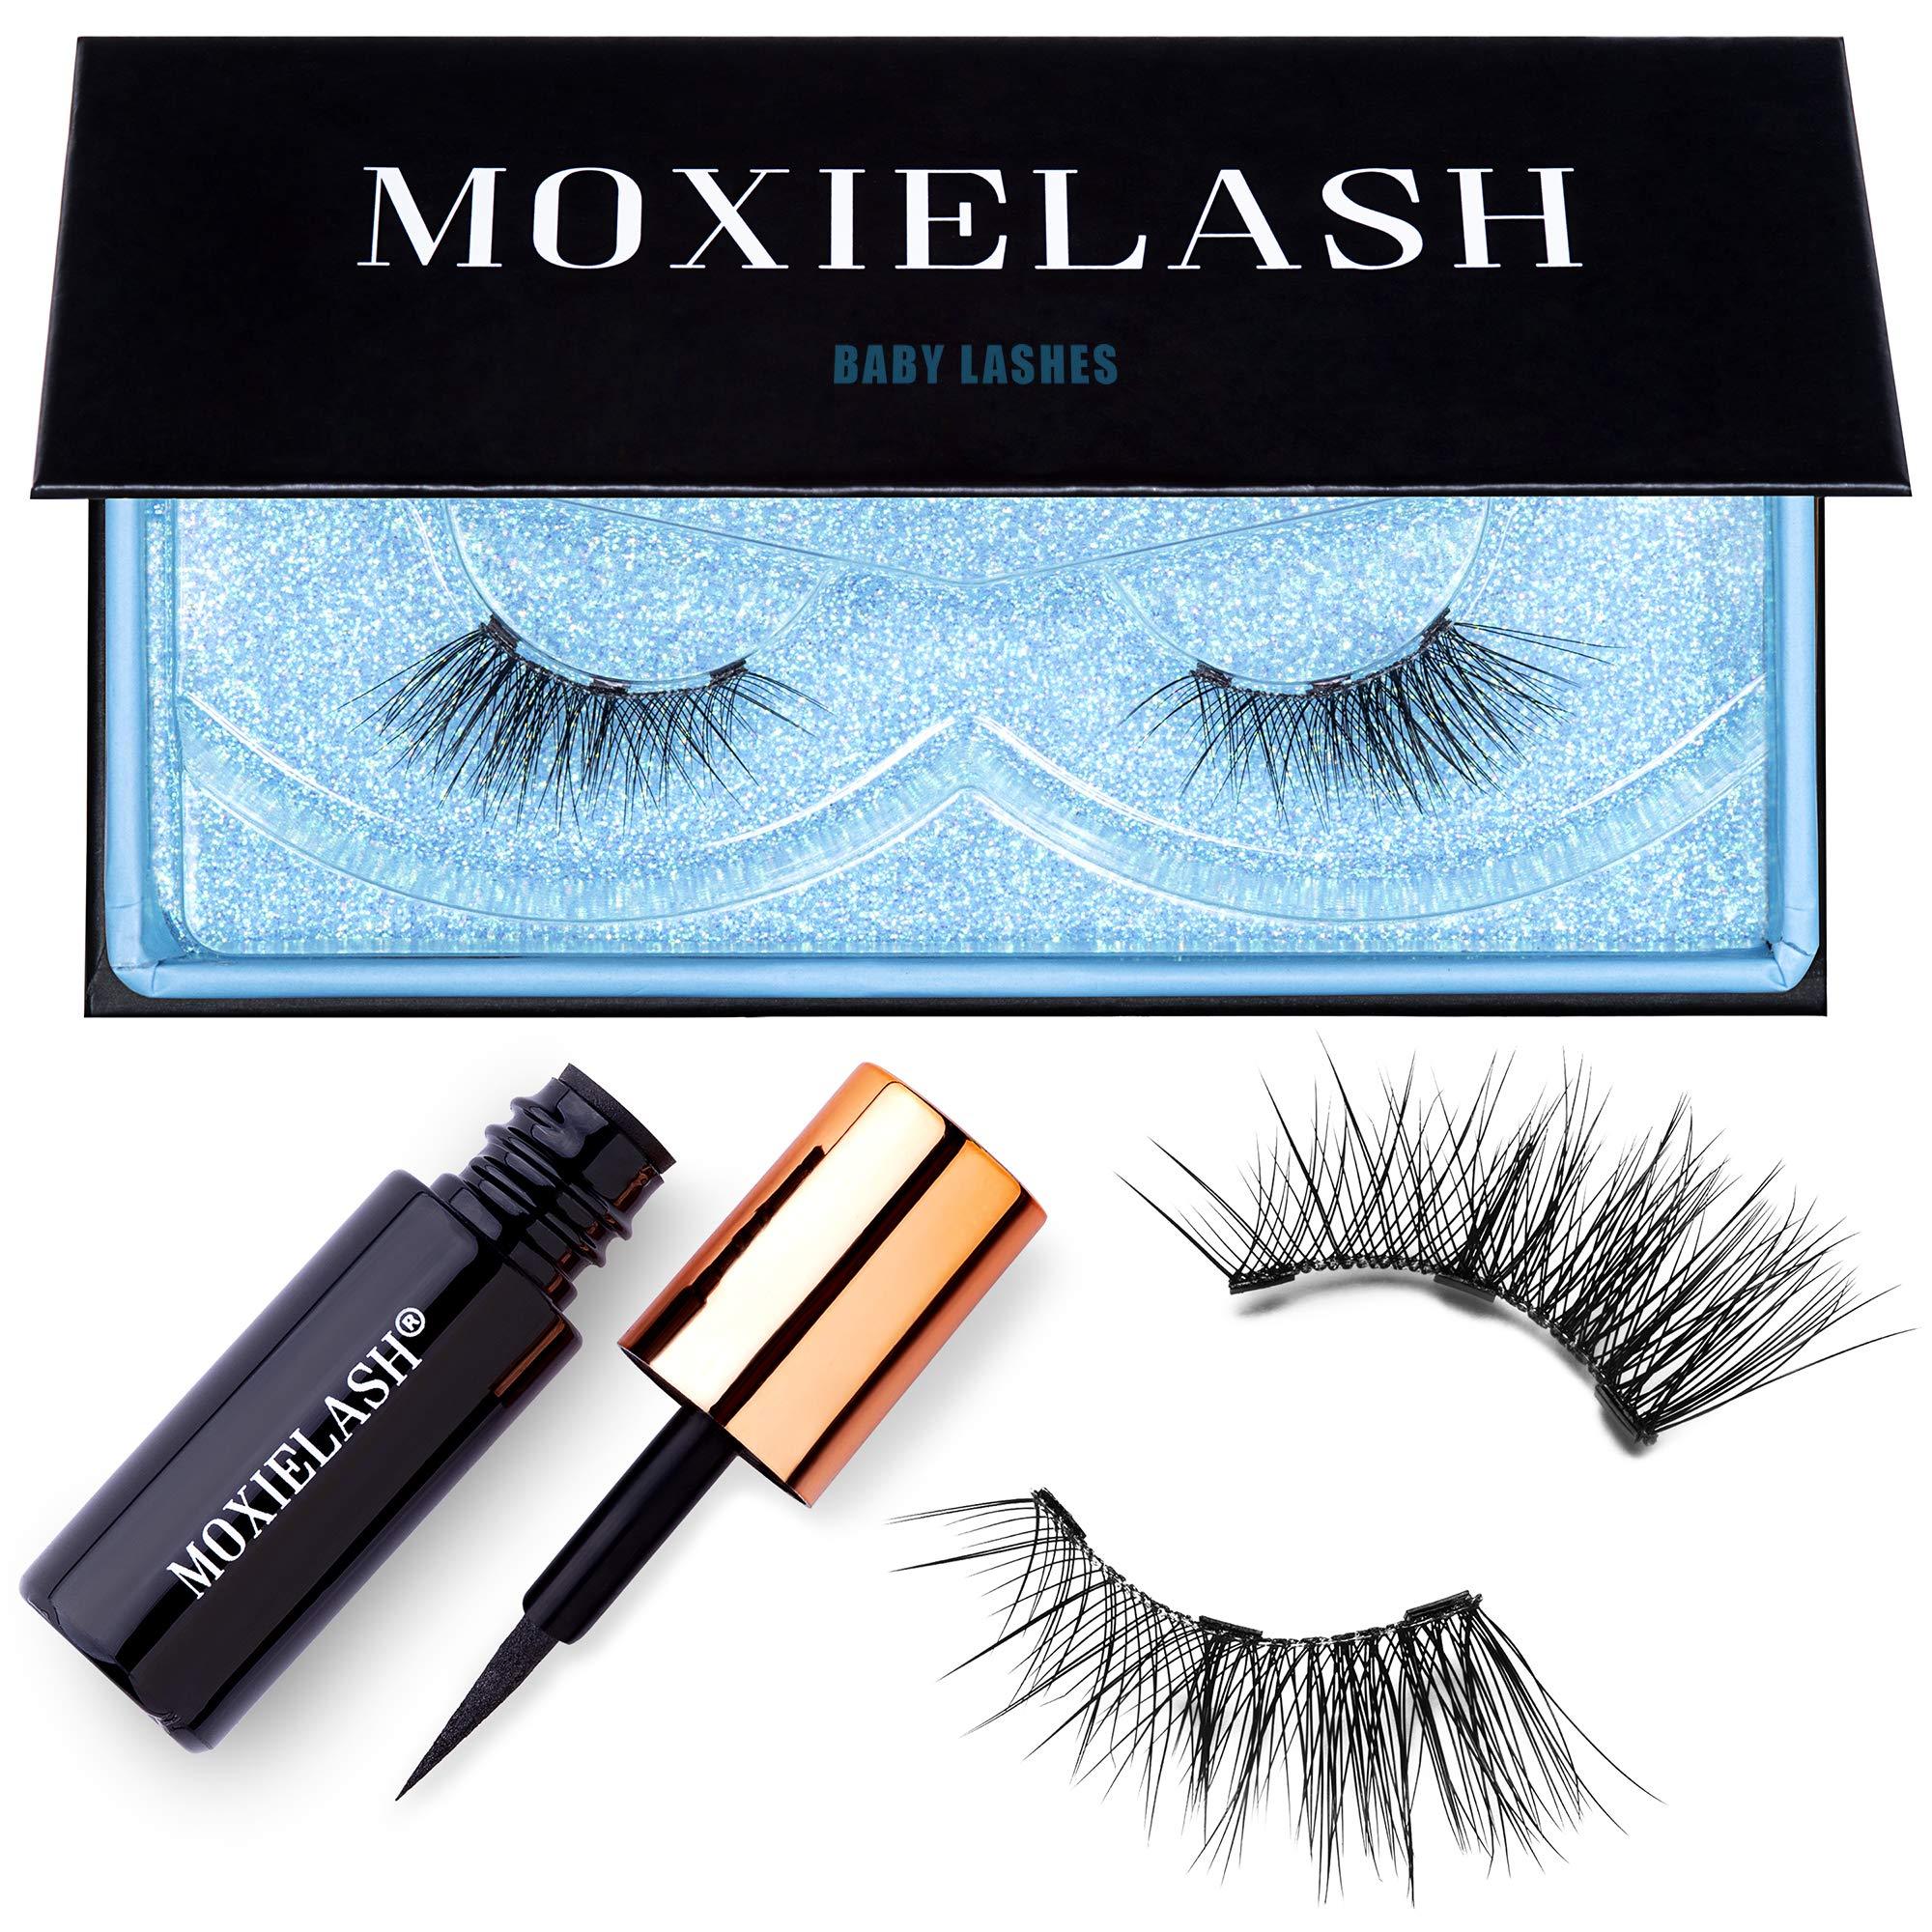 MoxieLash Baby Kit - Mini Magnetic Liquid Eyeliner for Magnetic Eyelashes - No Glue & Mess Free - Fast & Easy Application - Set of Baby Lashes & Instructions Included by MoxieLash